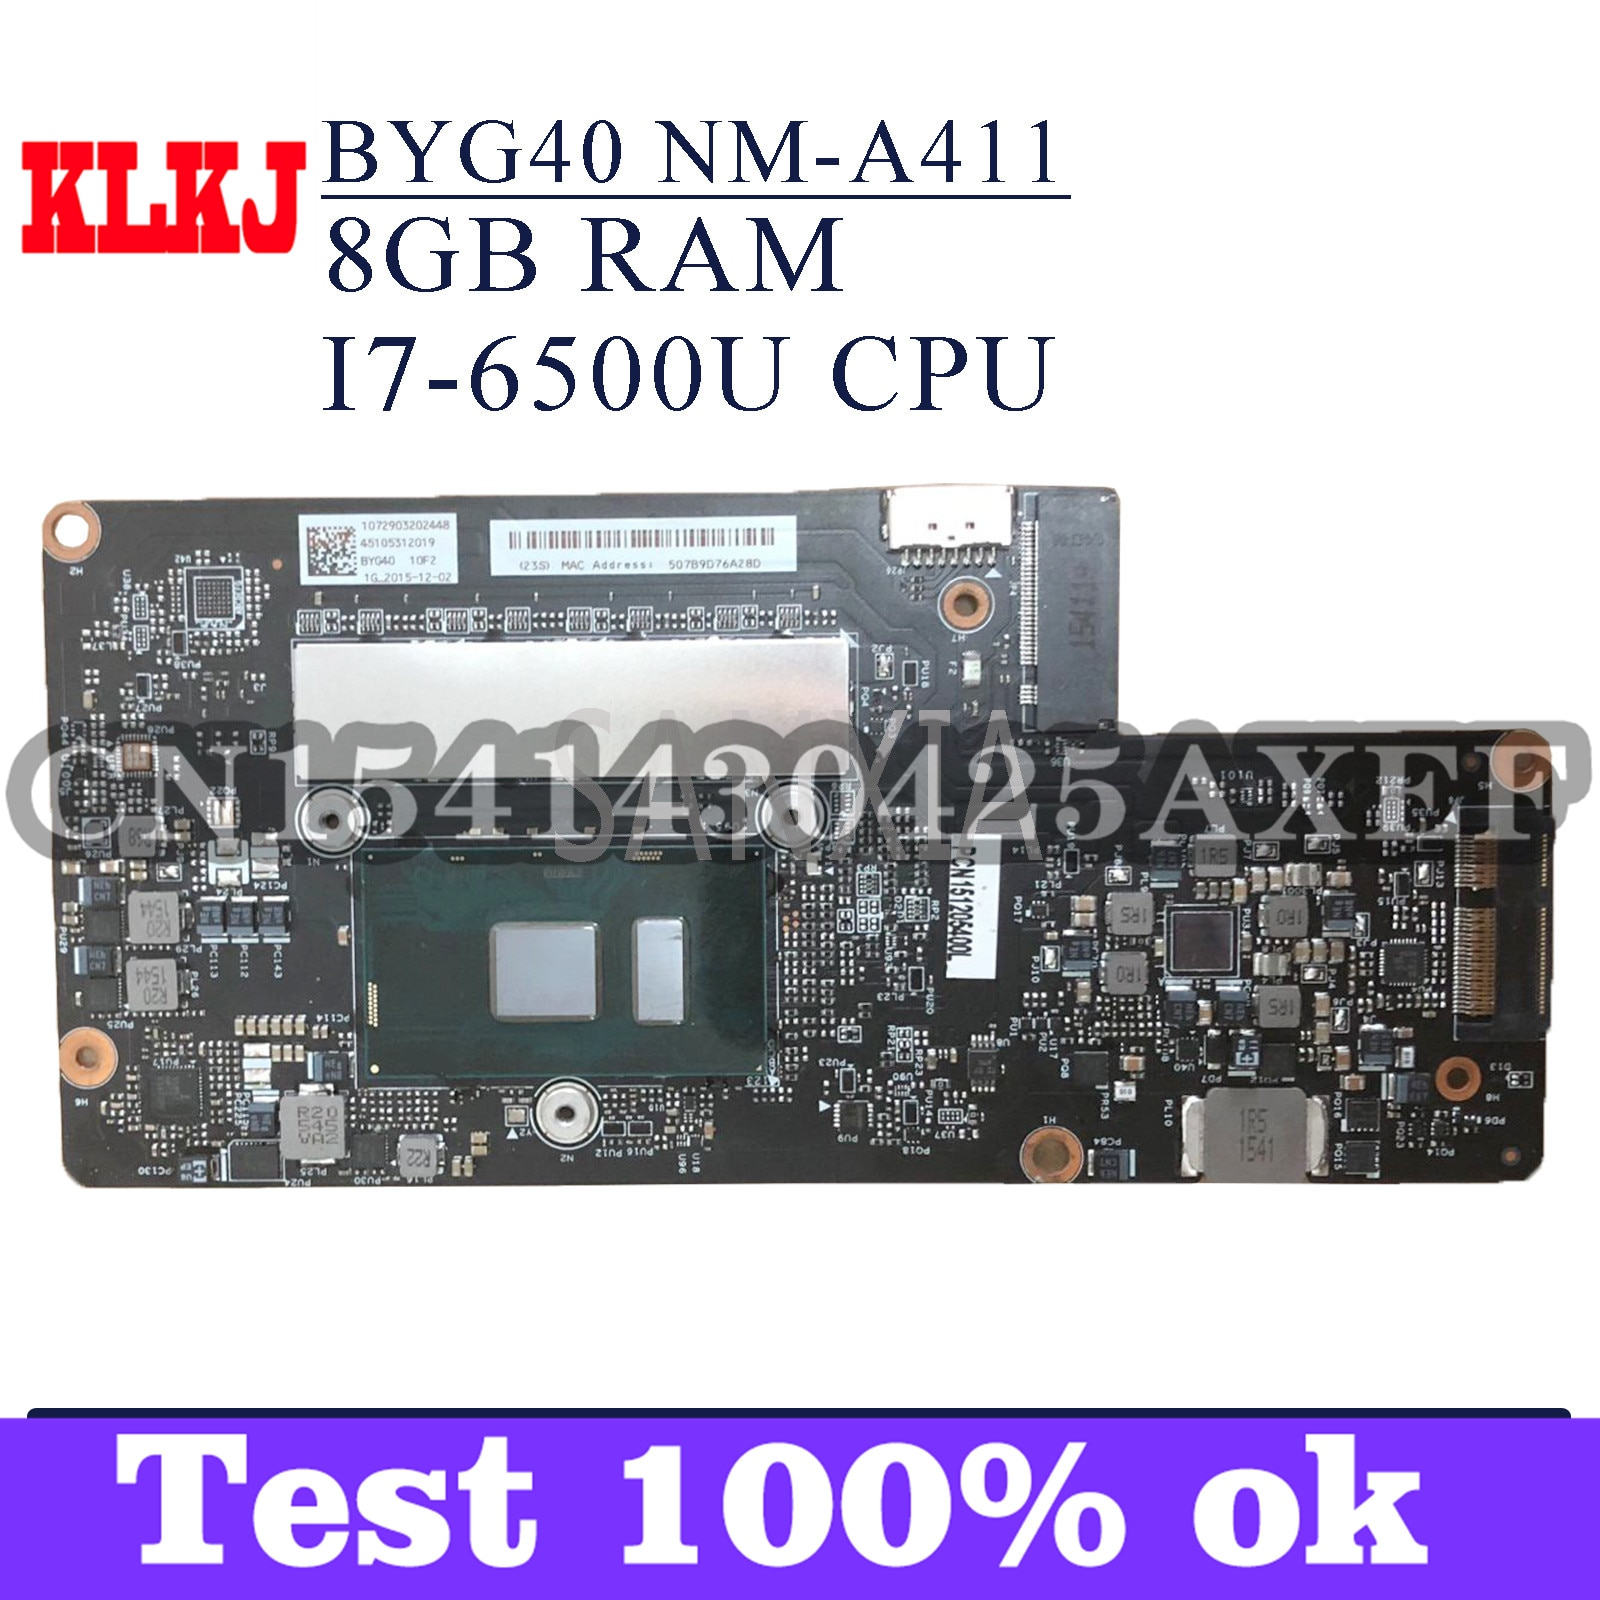 KLKJ NM-A411 اللوحة الأم للكمبيوتر المحمول لينوفو اليوغا 900-13ISK اللوحة الرئيسية الأصلية 8GB-RAM I7-6500U